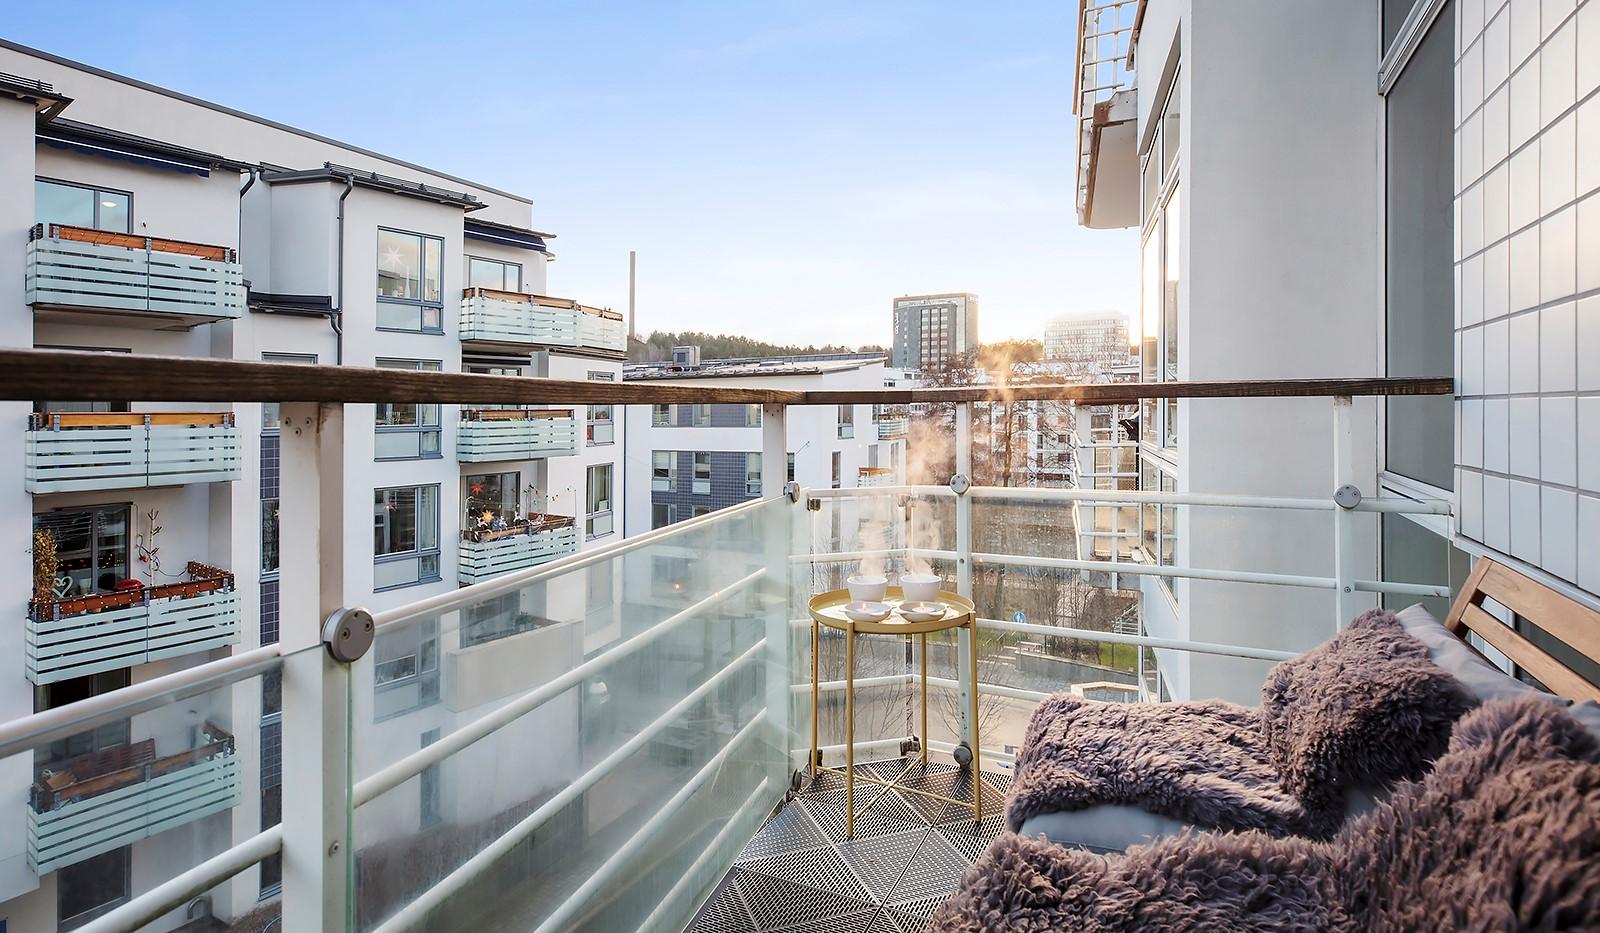 Sickla kanalgata 67, 3 tr - Möblerbar balkong i lugnt område